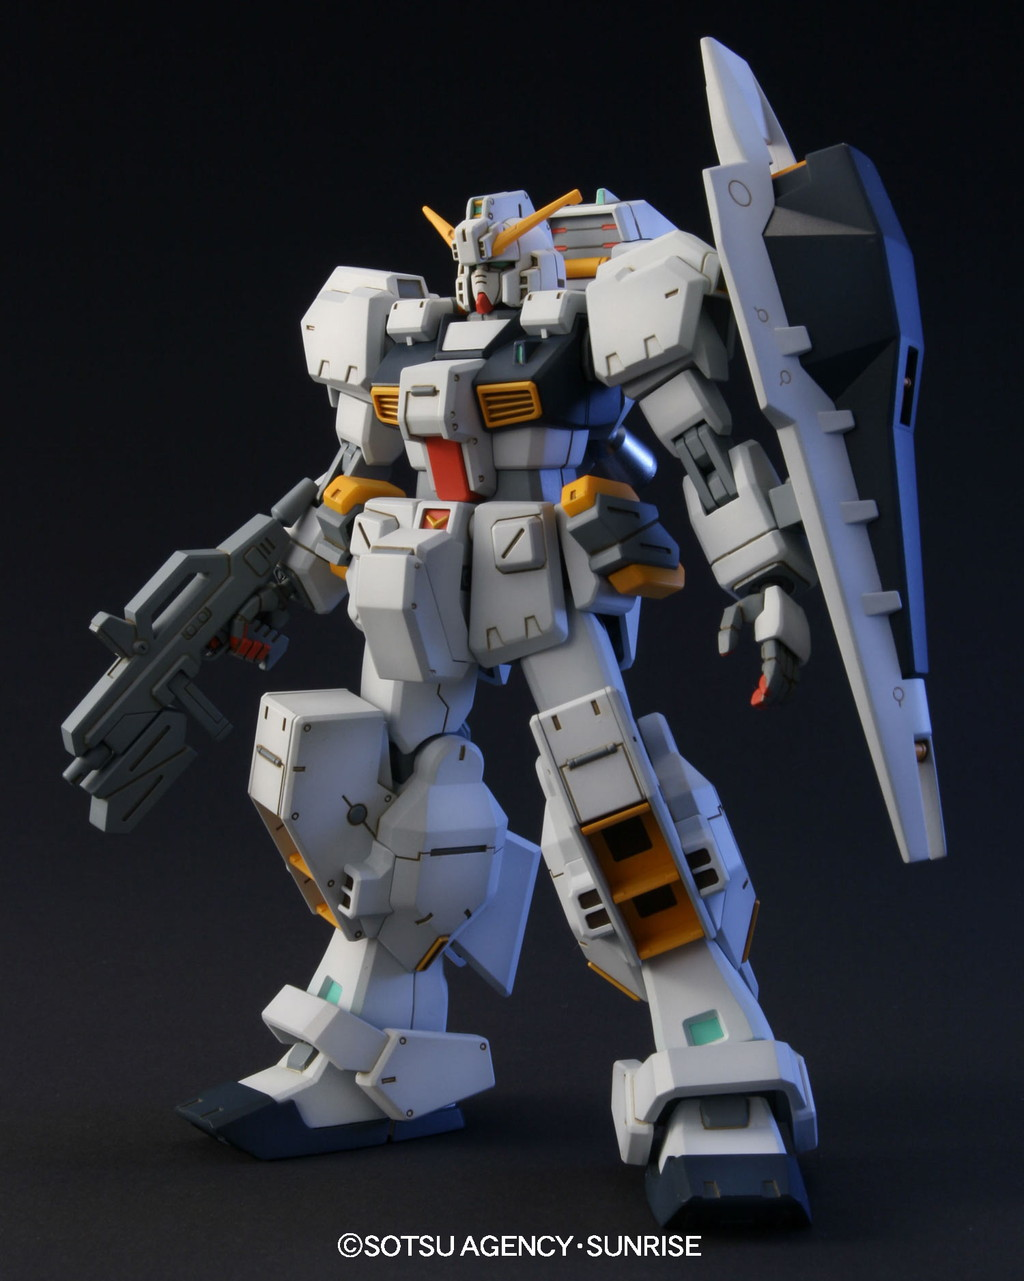 HGUC 1/144 RX-121-1 ガンダム TR-1[ヘイズル改] [Gundam TR-1 'Hazel Custom'] 5055608 0134107